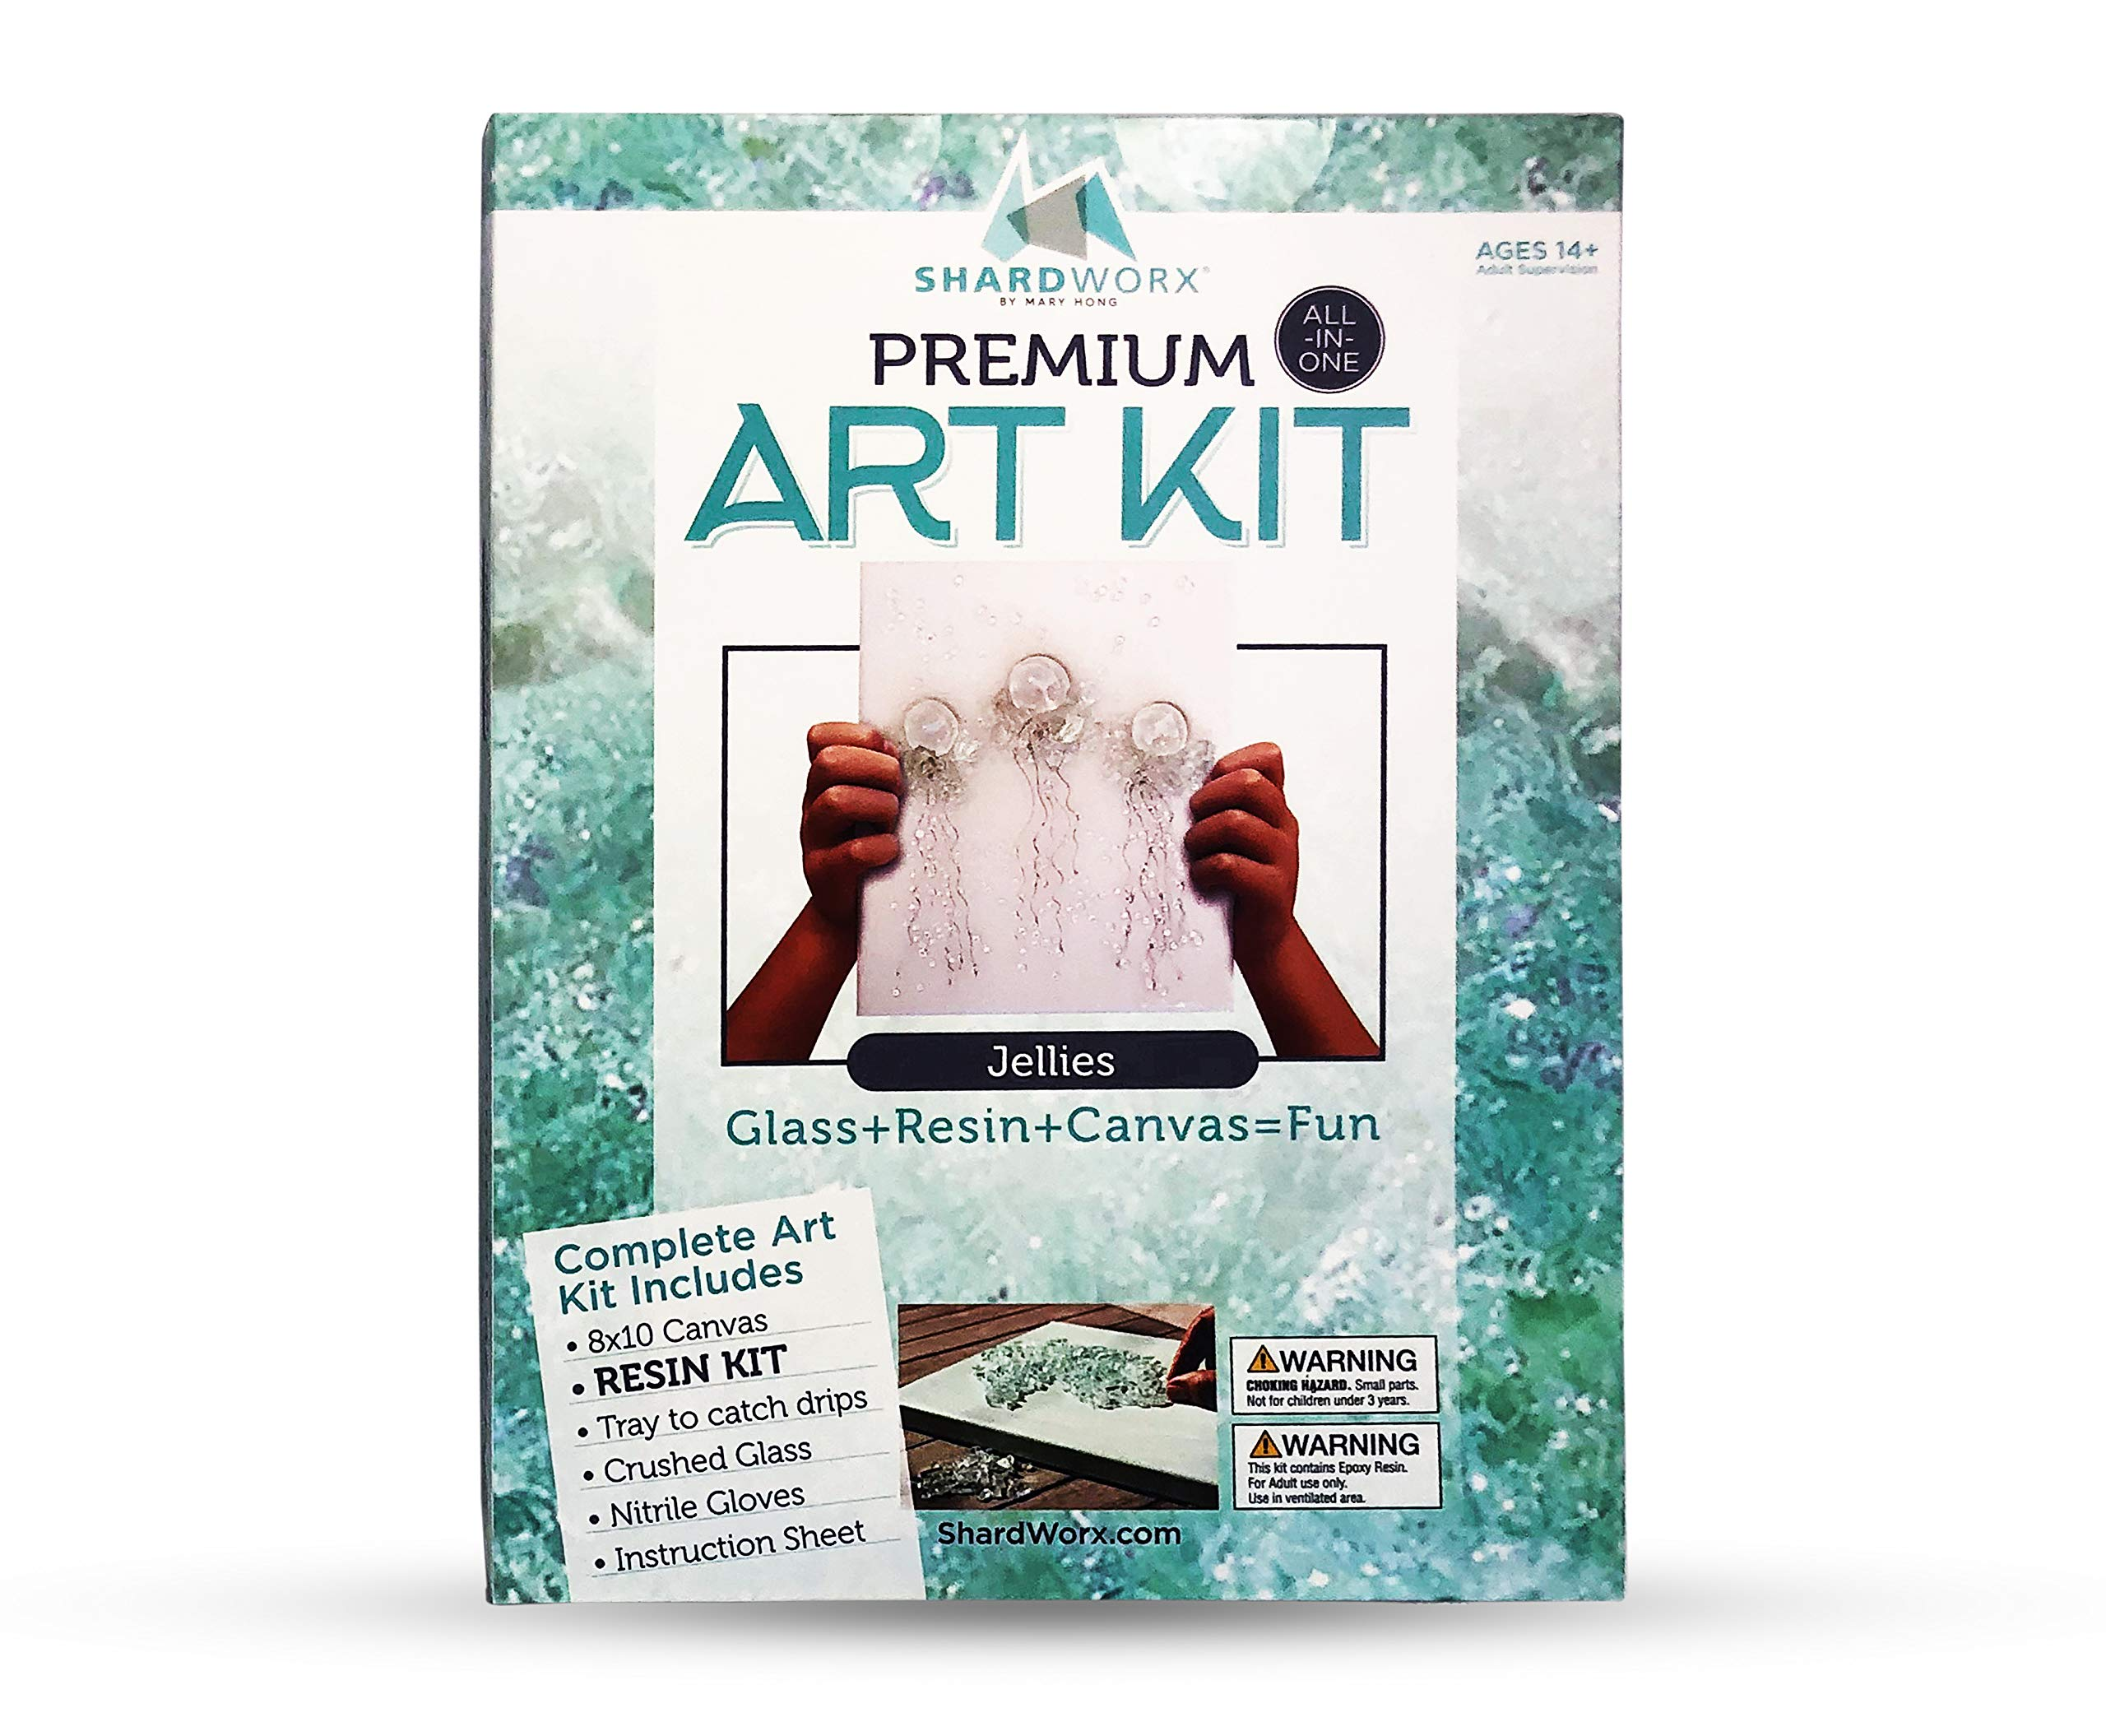 ShardWorx Art Kits by Mary Hong - Mixed Media Glass Art - Jellies Premium Kit by ShardWorx